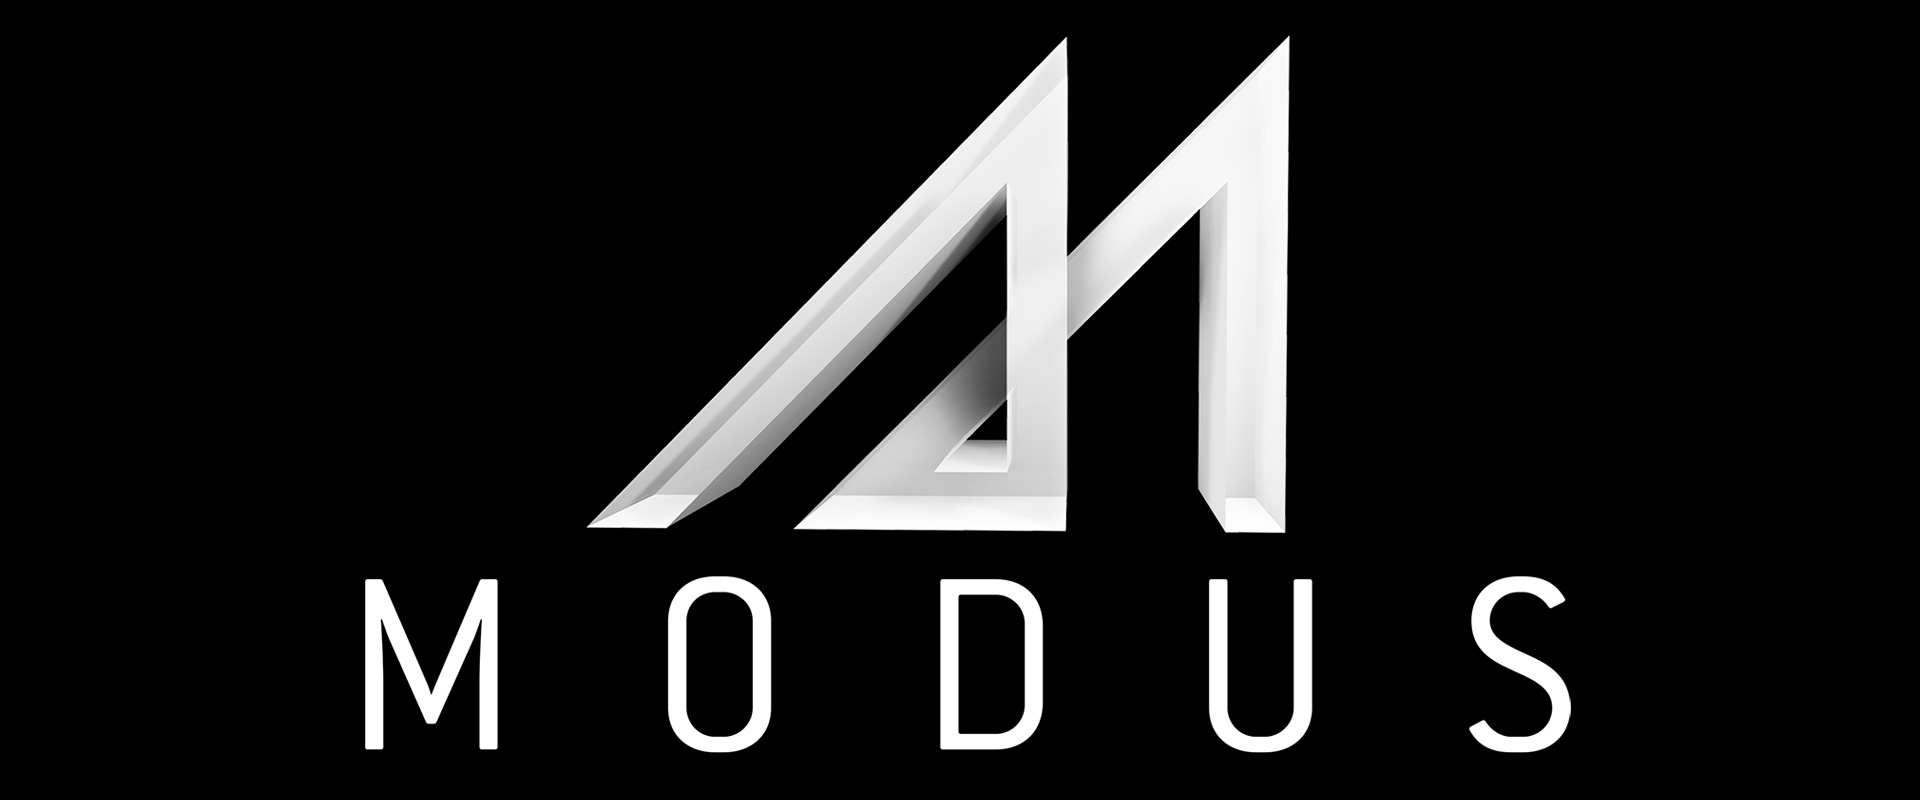 modus_logo_1080p.jpg